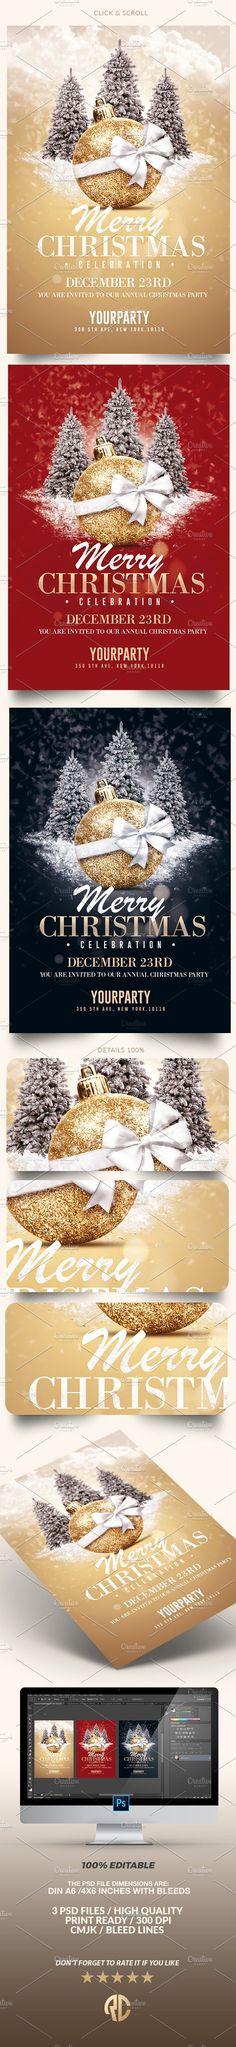 Great ! Christmas Invitation - Psd Templates  #christmas #invitation #templates #creativemarket